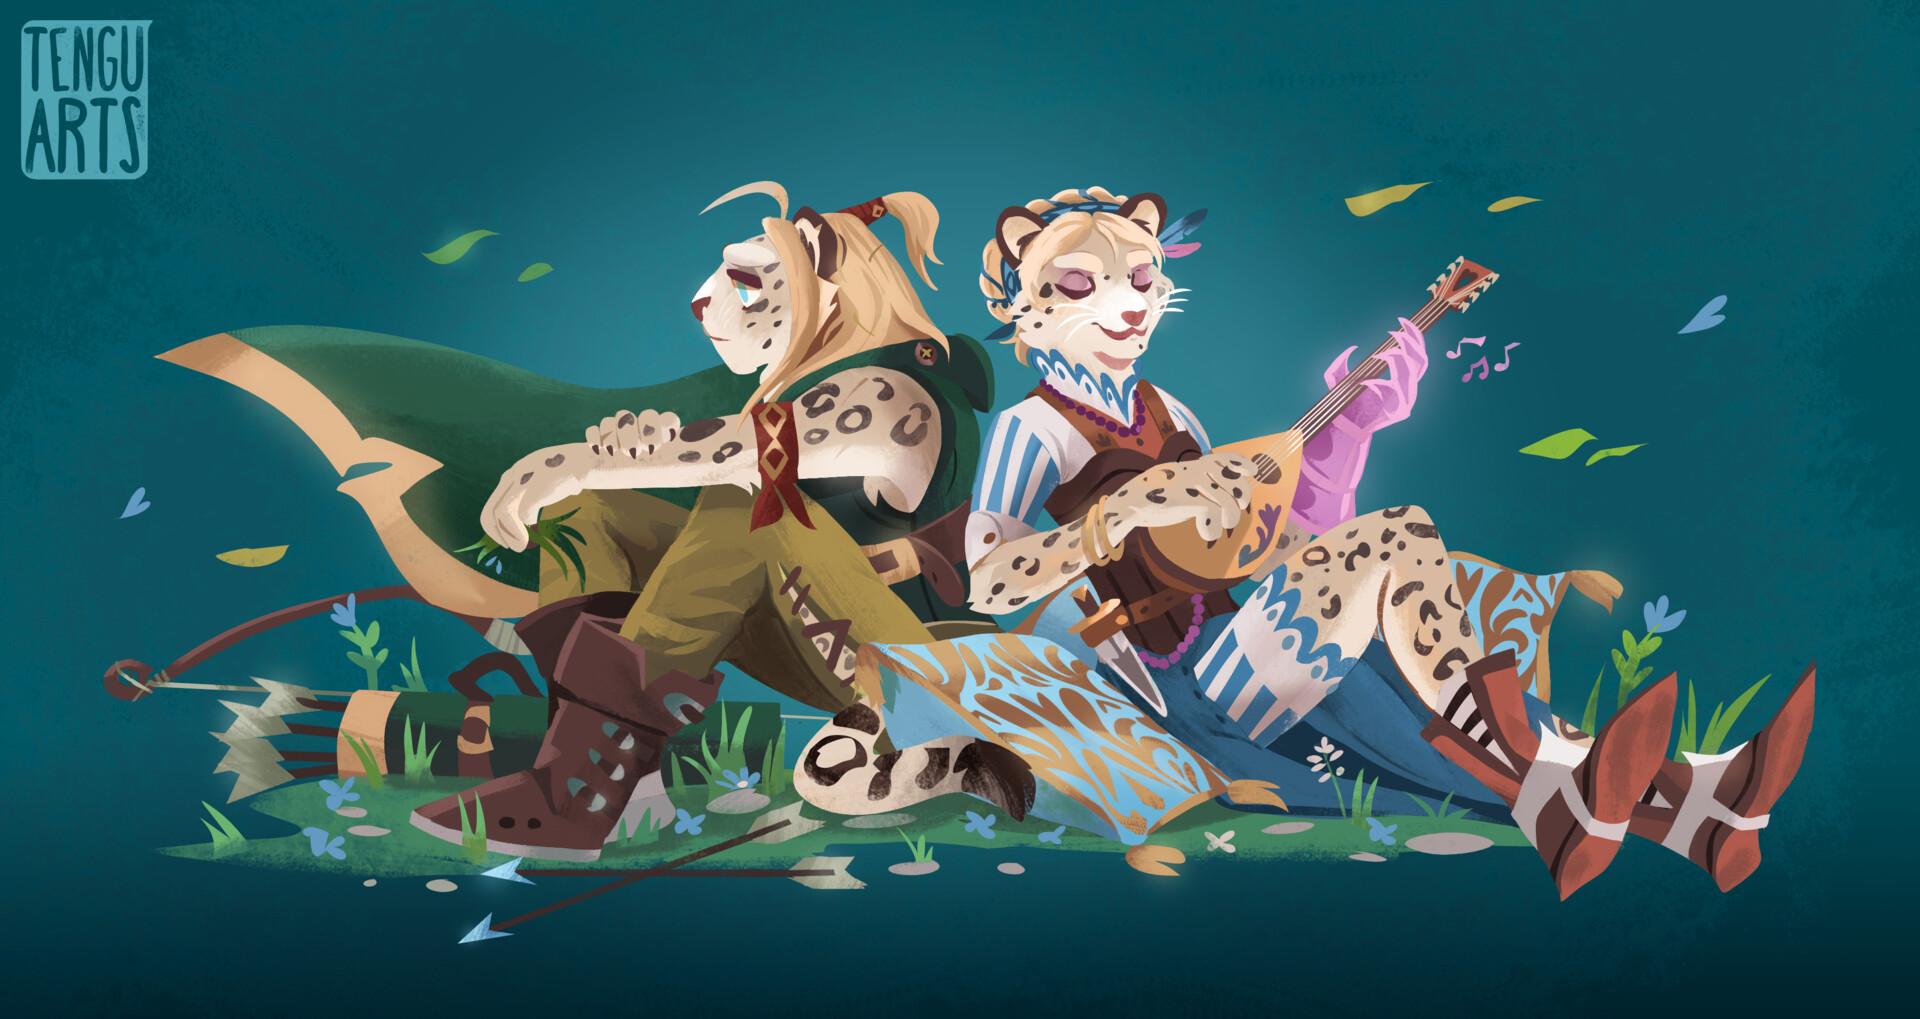 Tengu arts ishyra nasir by tengu arts